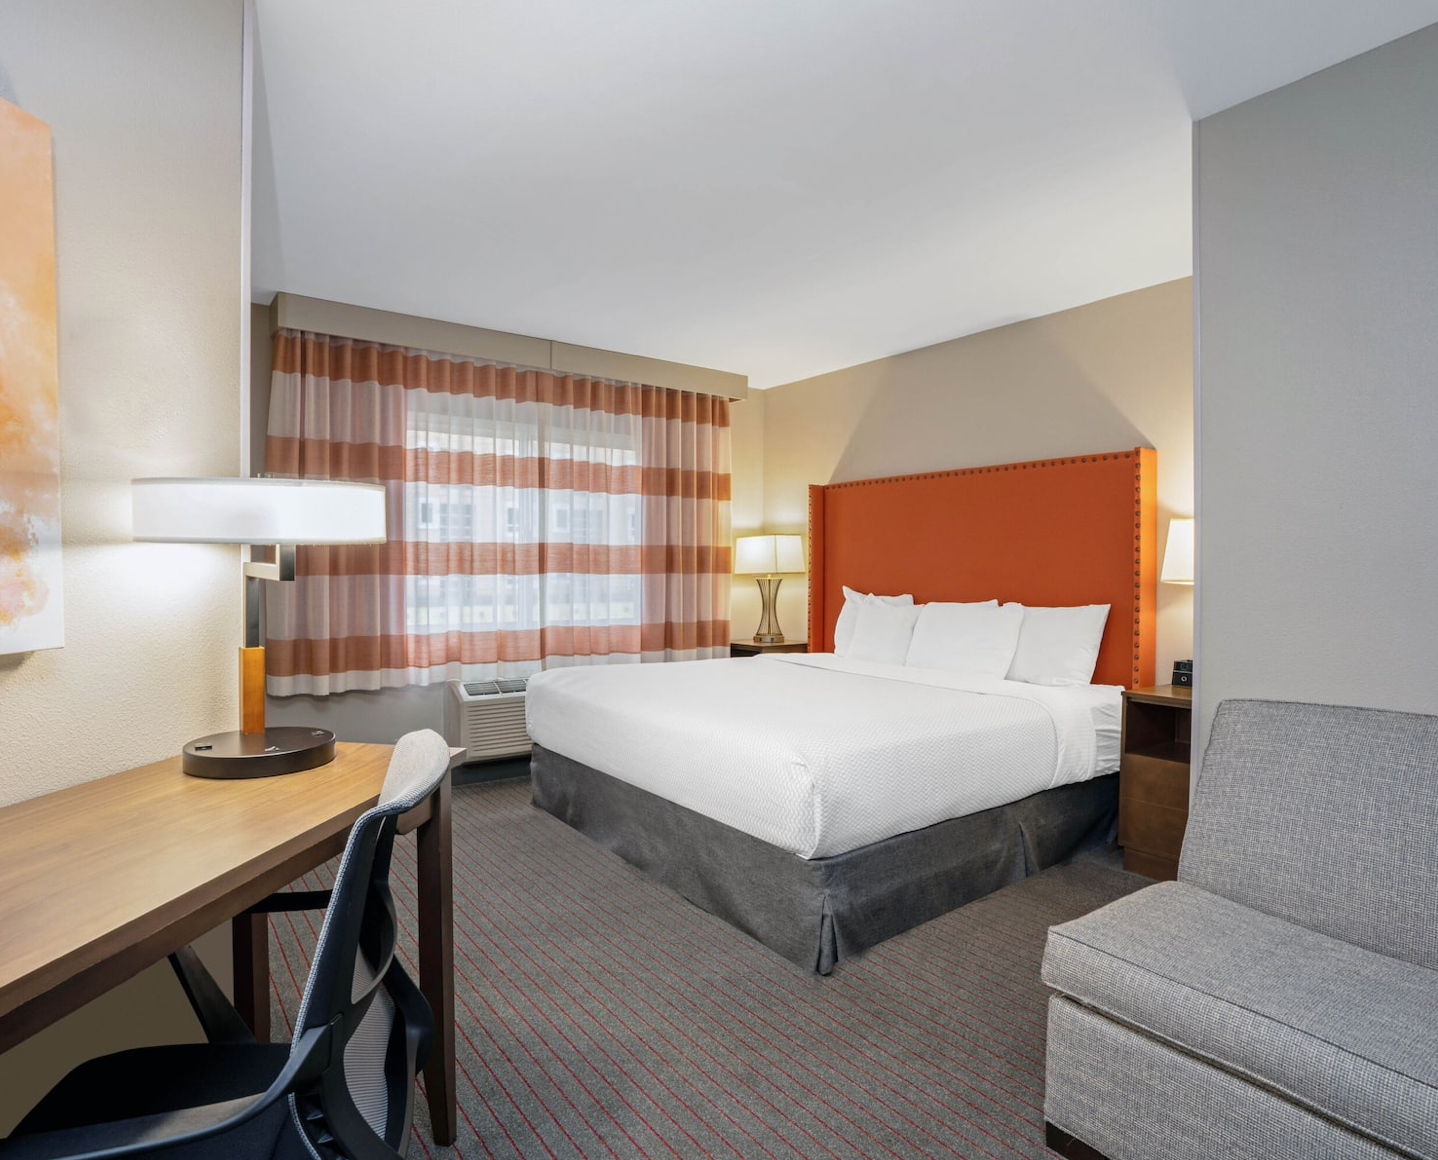 https://www.hotelsbyday.com/_data/default-hotel_image/4/22764/screen-shot-2020-10-29-at-12-37-52-am.png